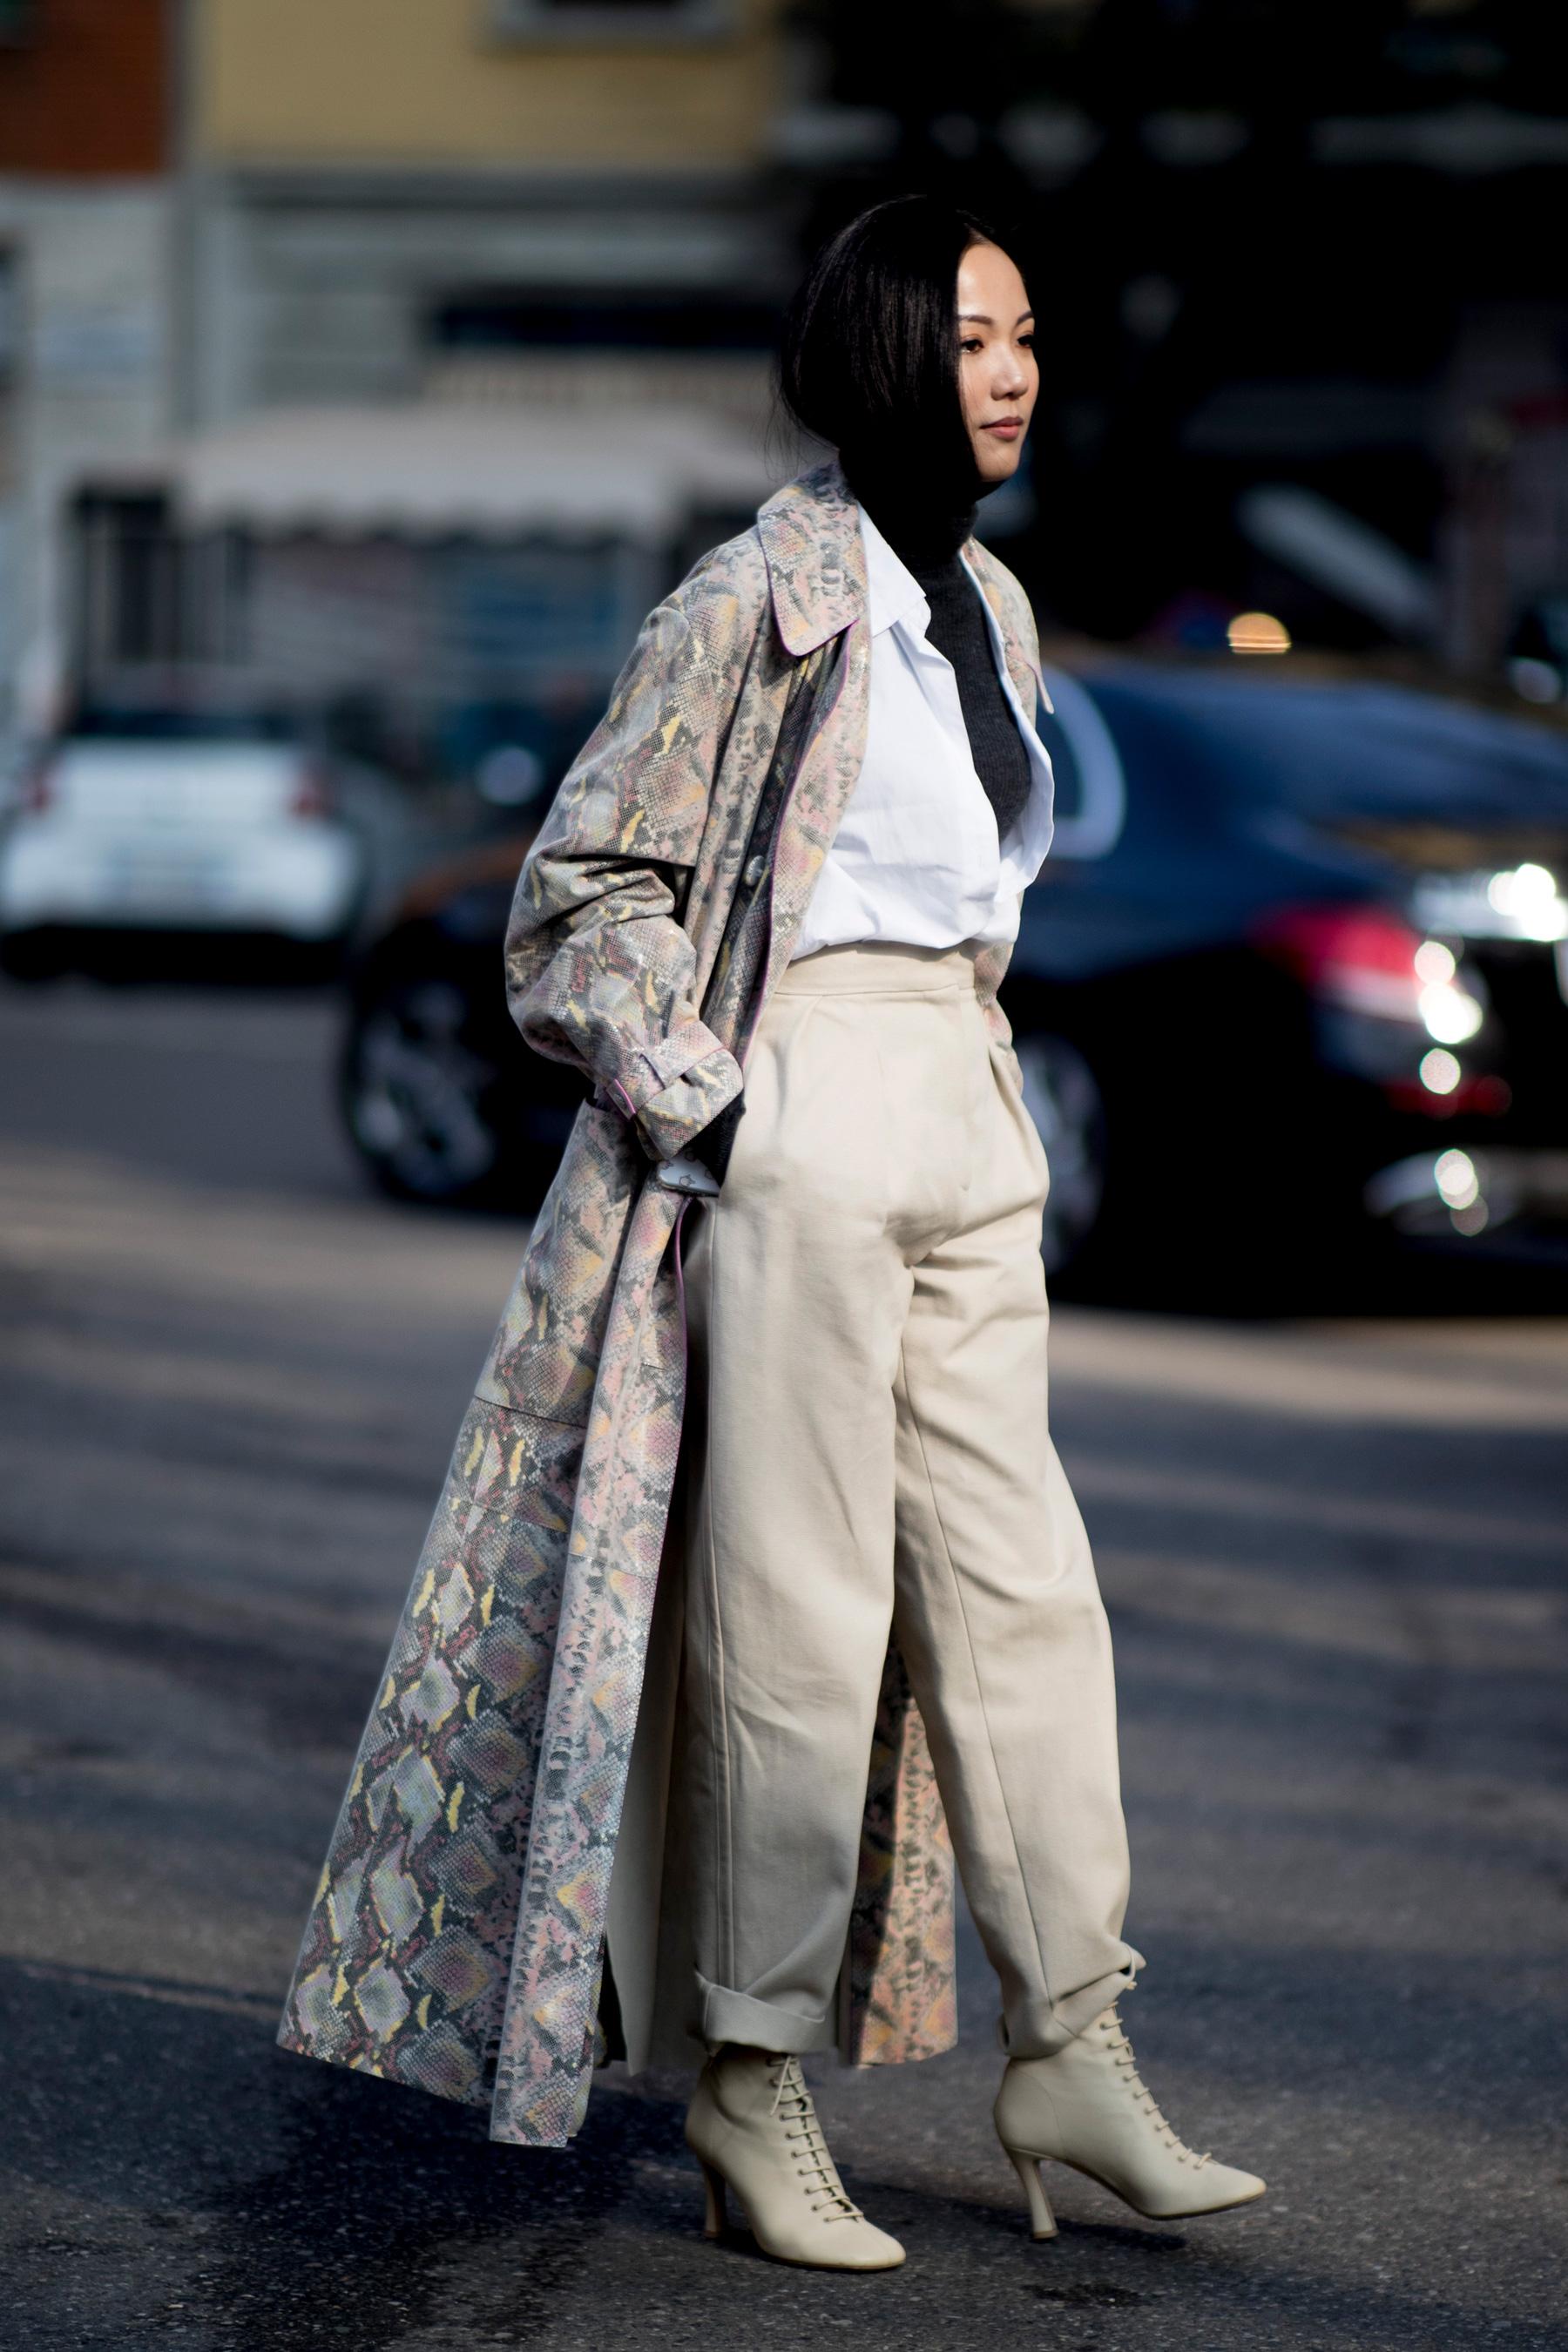 Milano Street Day 2 Fall 2019 Fashion Show